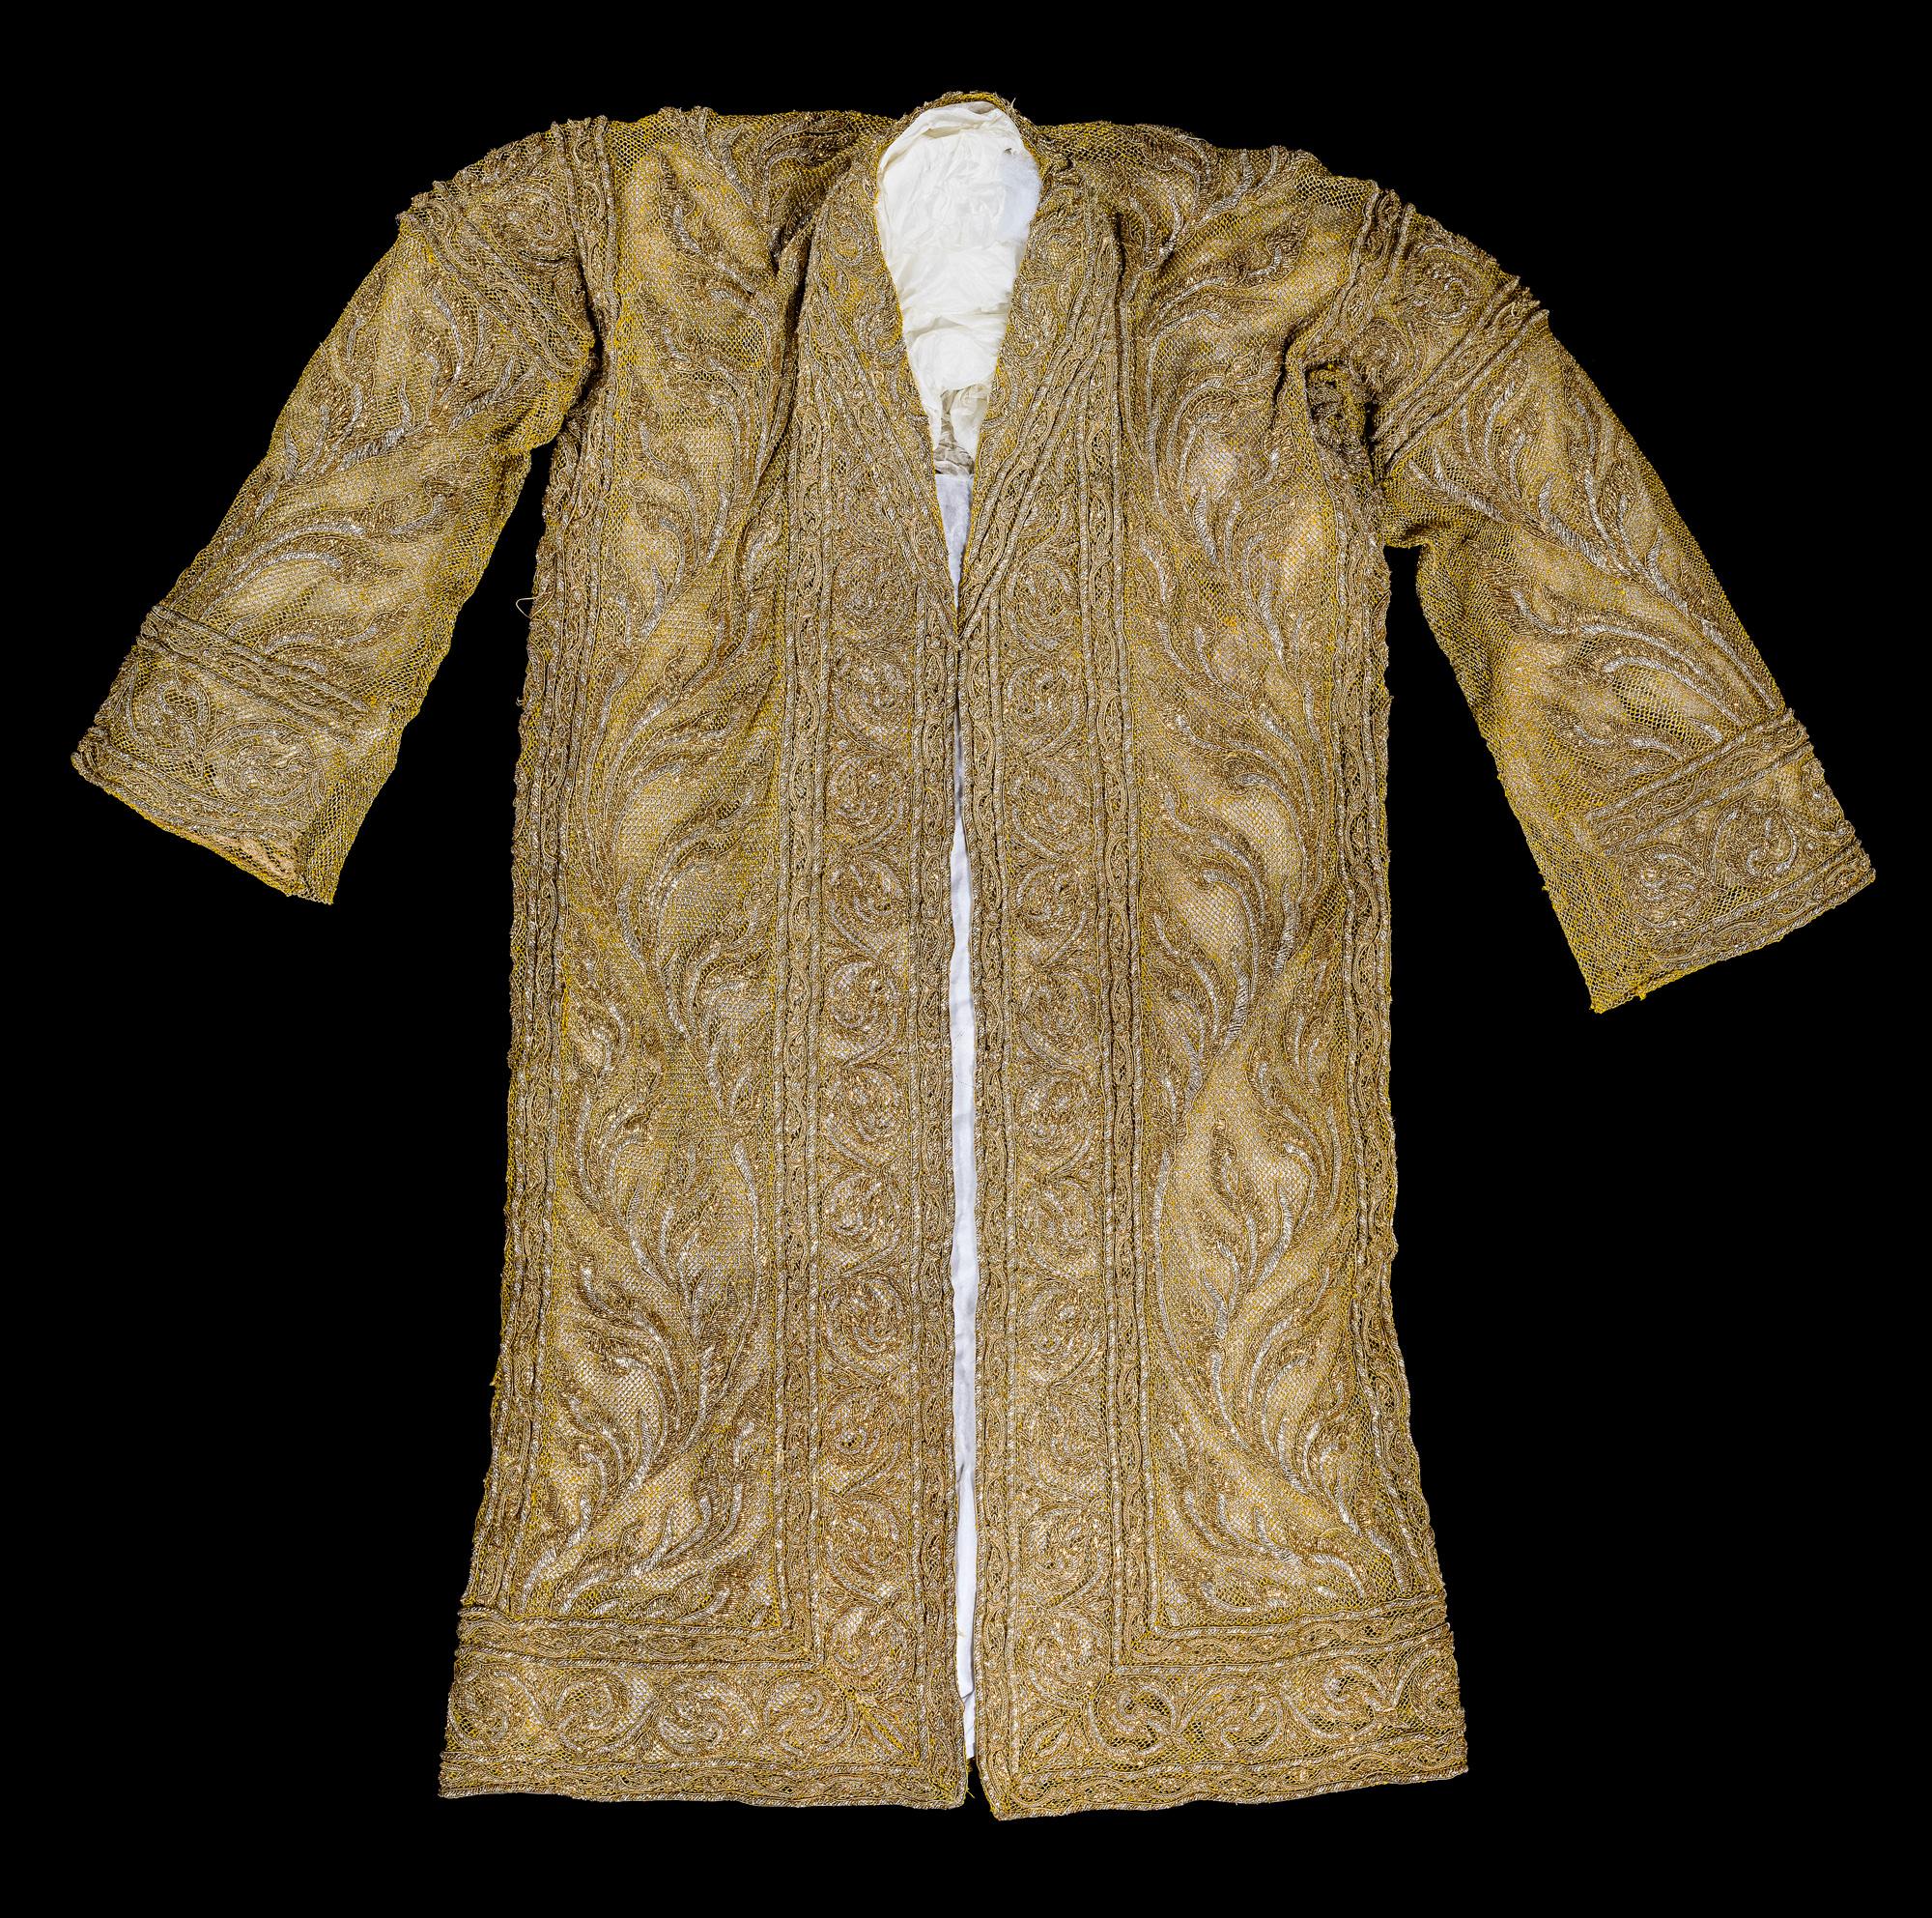 Chalong Phra Ong Khrui (Ceremonial Gold Robe) Gift from Prince Wan Waithayakon to the Smithsonian Institution, 1947 98 x 79 cm Courtesy of the Smithsonian Institution, Department of Anthropology; E-385867-0; Photo by Jim Di Loreto  ฉลองพระองค์ครุย ของขวัญประทานจากพระเจ้าวรวงศ์เธอ พระองค์เจ้าวรรณไวทยากร กรมหมื่นนราธิปพงศ์ประพันธ์ แก่สถาบันสมิธโซเนียน พ.ศ. ๒๔๙๐ ๙๘ x ๗๙ ซม. ได้รับความอนุเคราะห์จากฝ่ายมานุษยวิทยา สถาบันสมิธโซเนียน ; E-385867-0; ถ่ายโดยจิม ดิลอเรโต